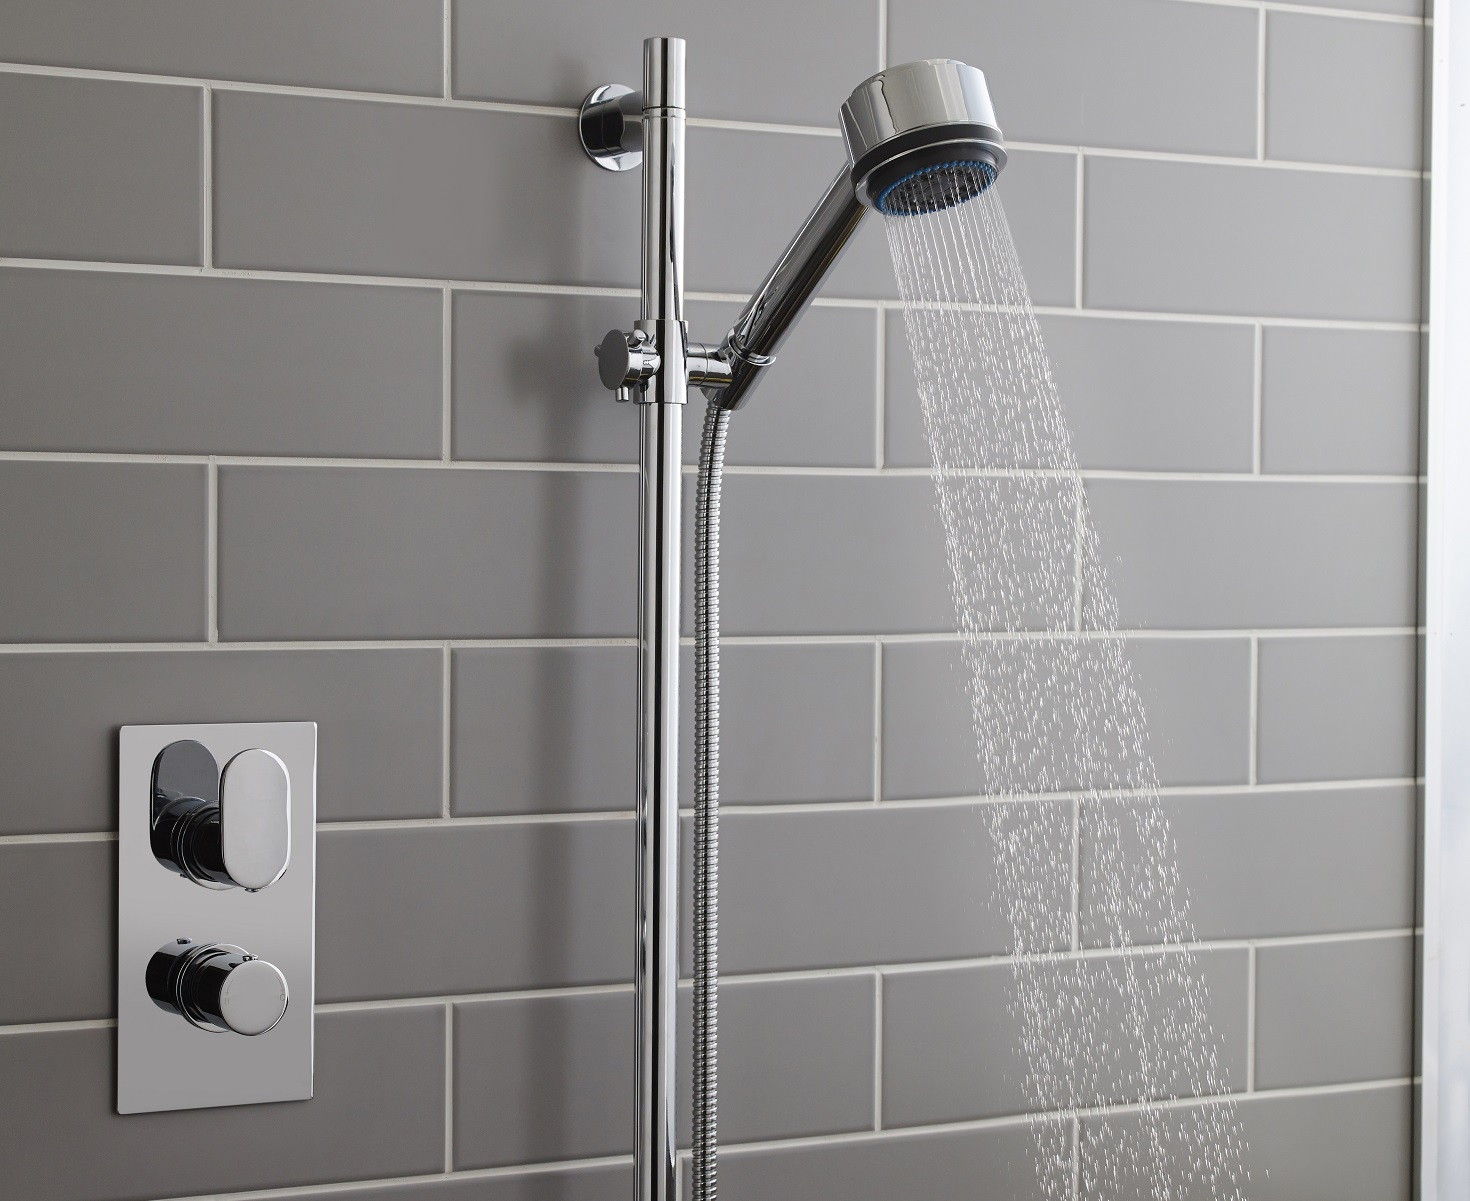 how to descale a shower head big bathroom shop. Black Bedroom Furniture Sets. Home Design Ideas